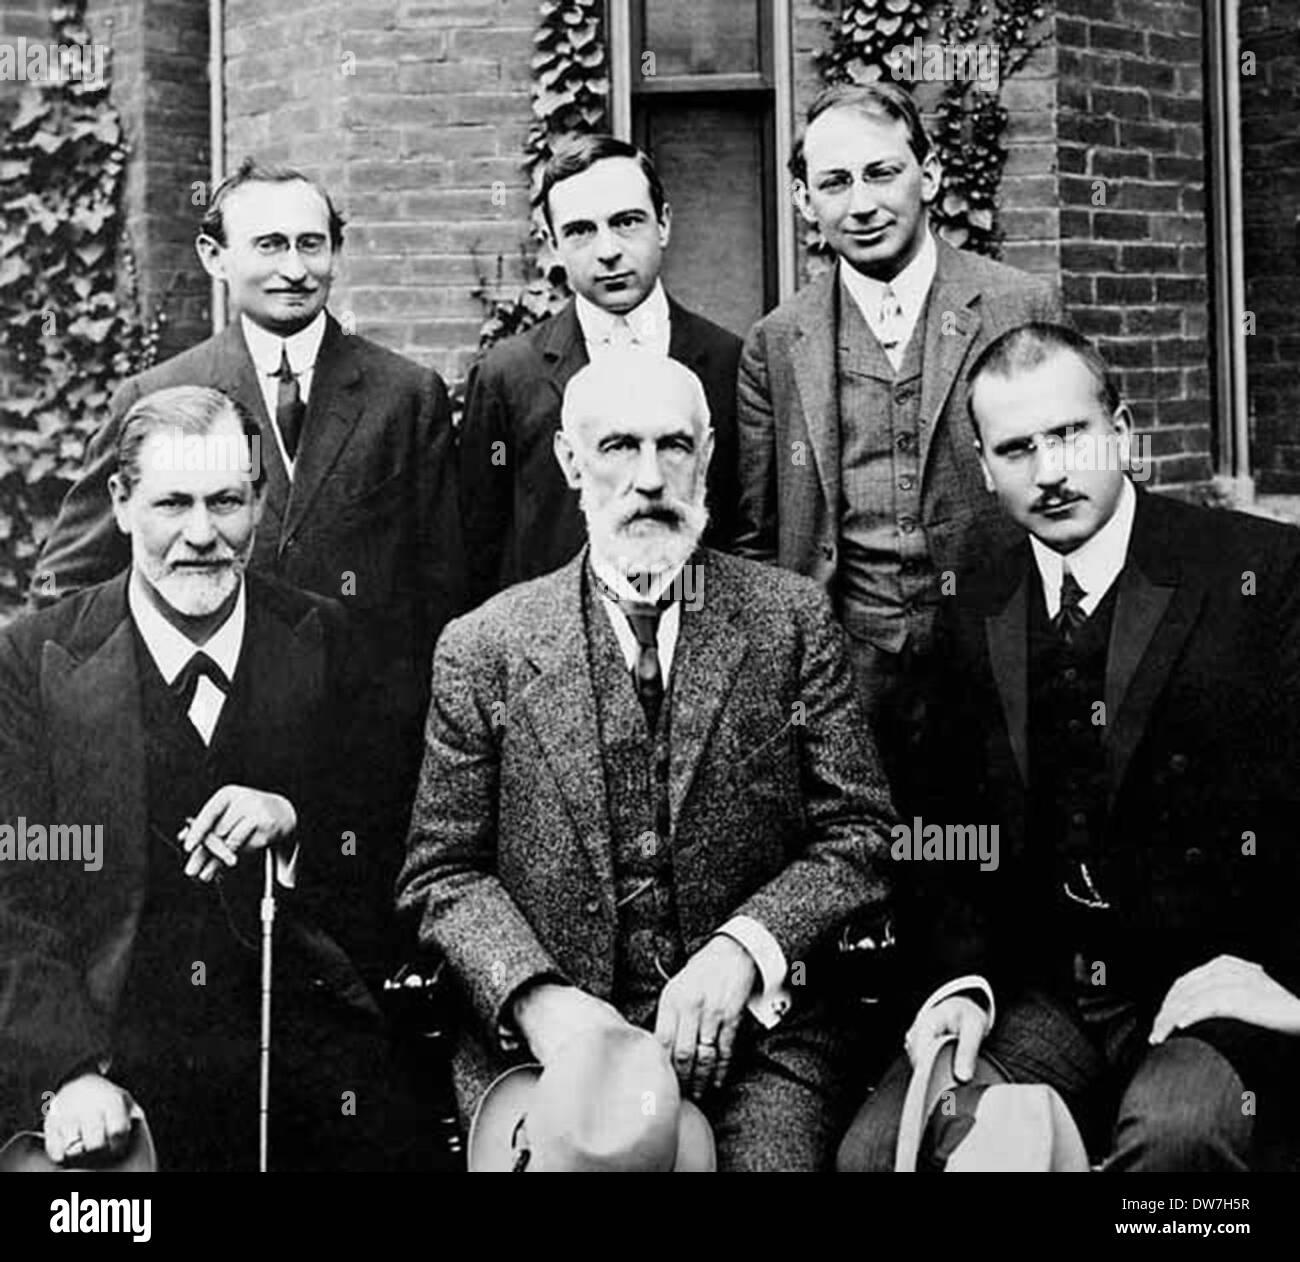 Front row, Sigmund Freud, G. Stanley Hall, Carl Jung, back row, Abraham A. Brill, Ernest Jones, Sándor Ferenczi - Stock Image